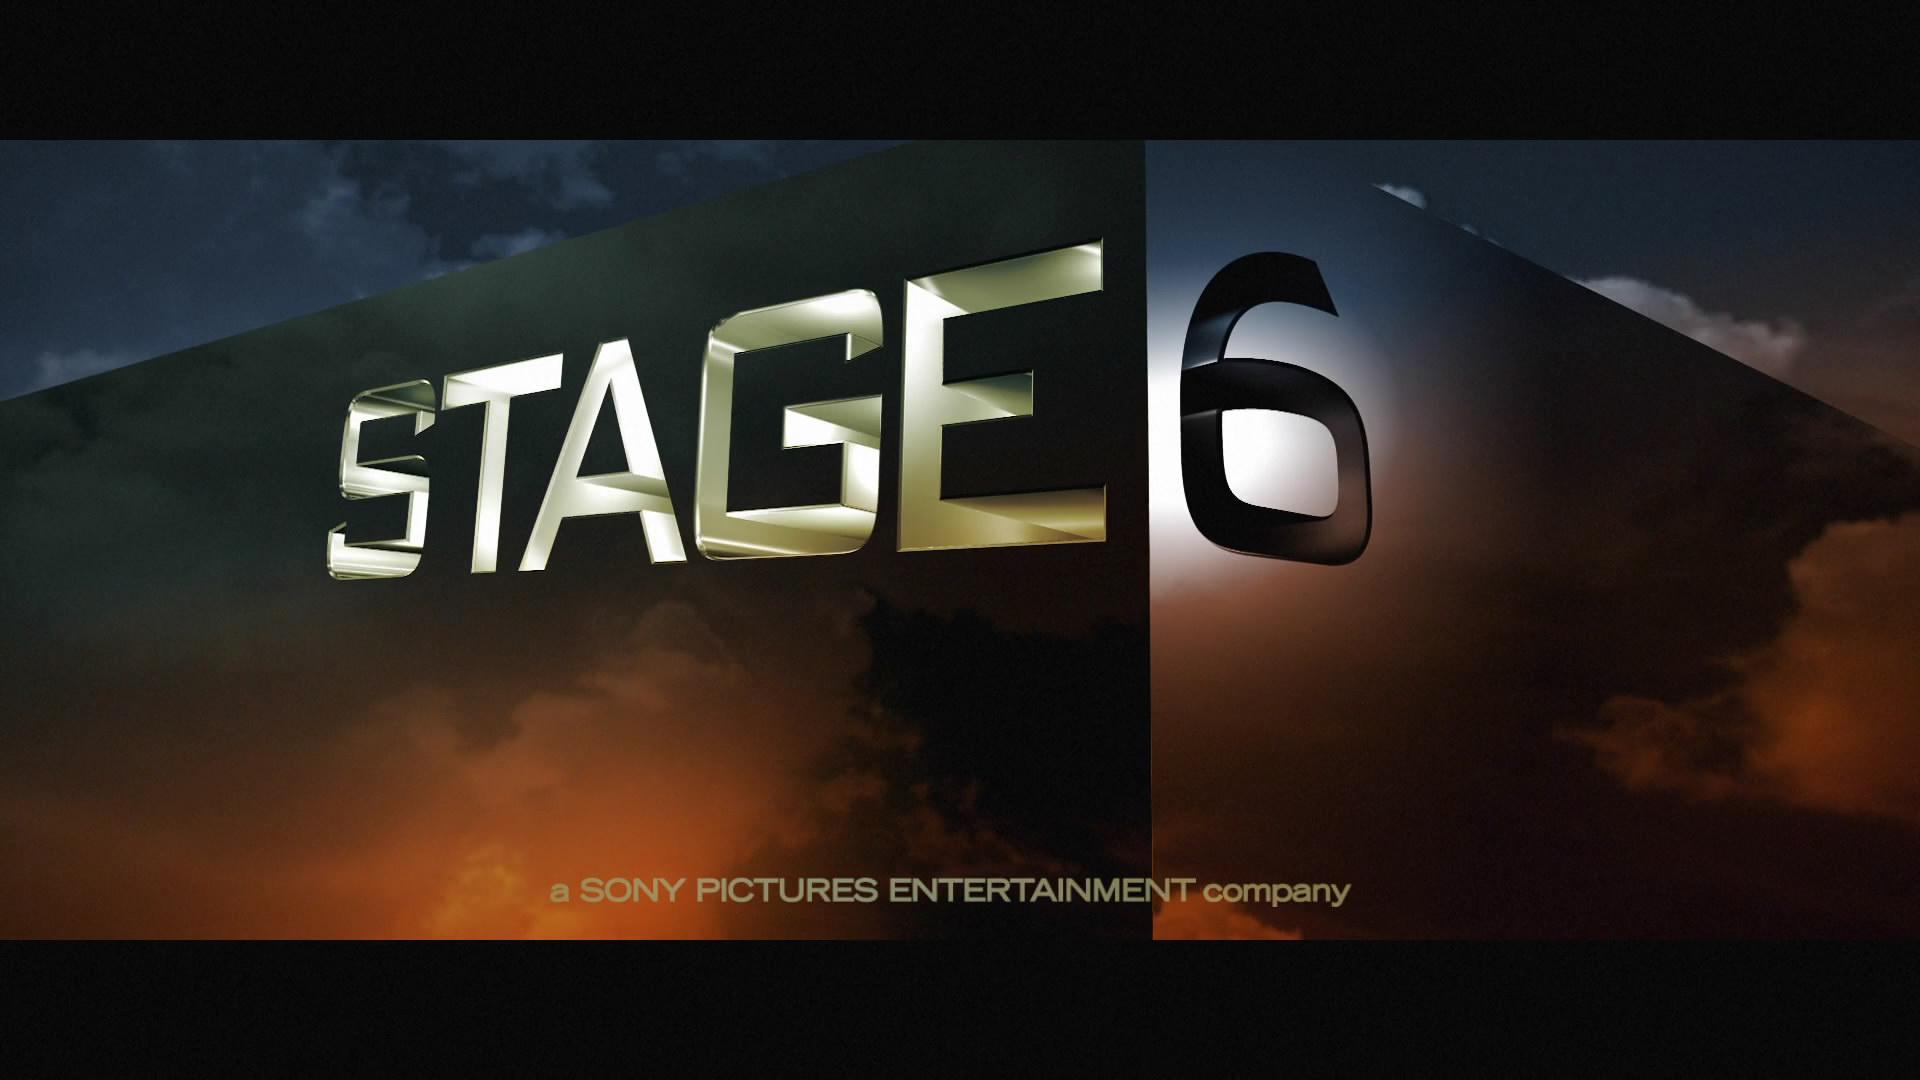 Stage 6 Films